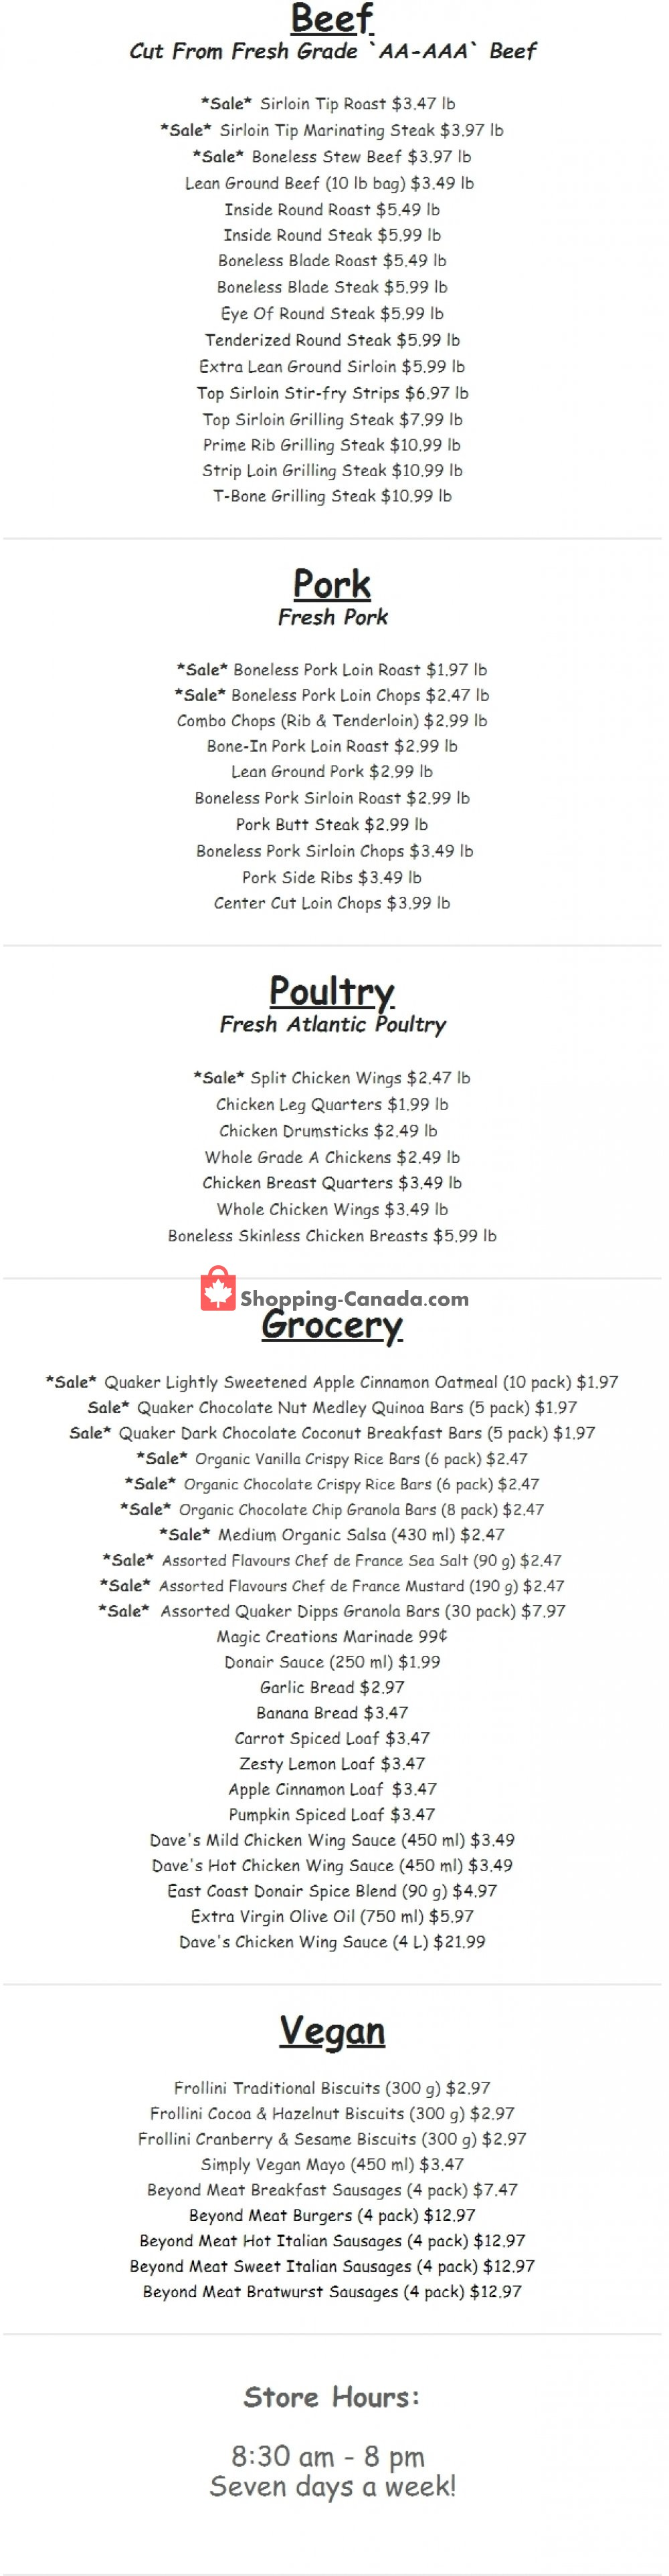 Flyer Gateway Meat Market Canada - from Thursday November 7, 2019 to Wednesday November 13, 2019